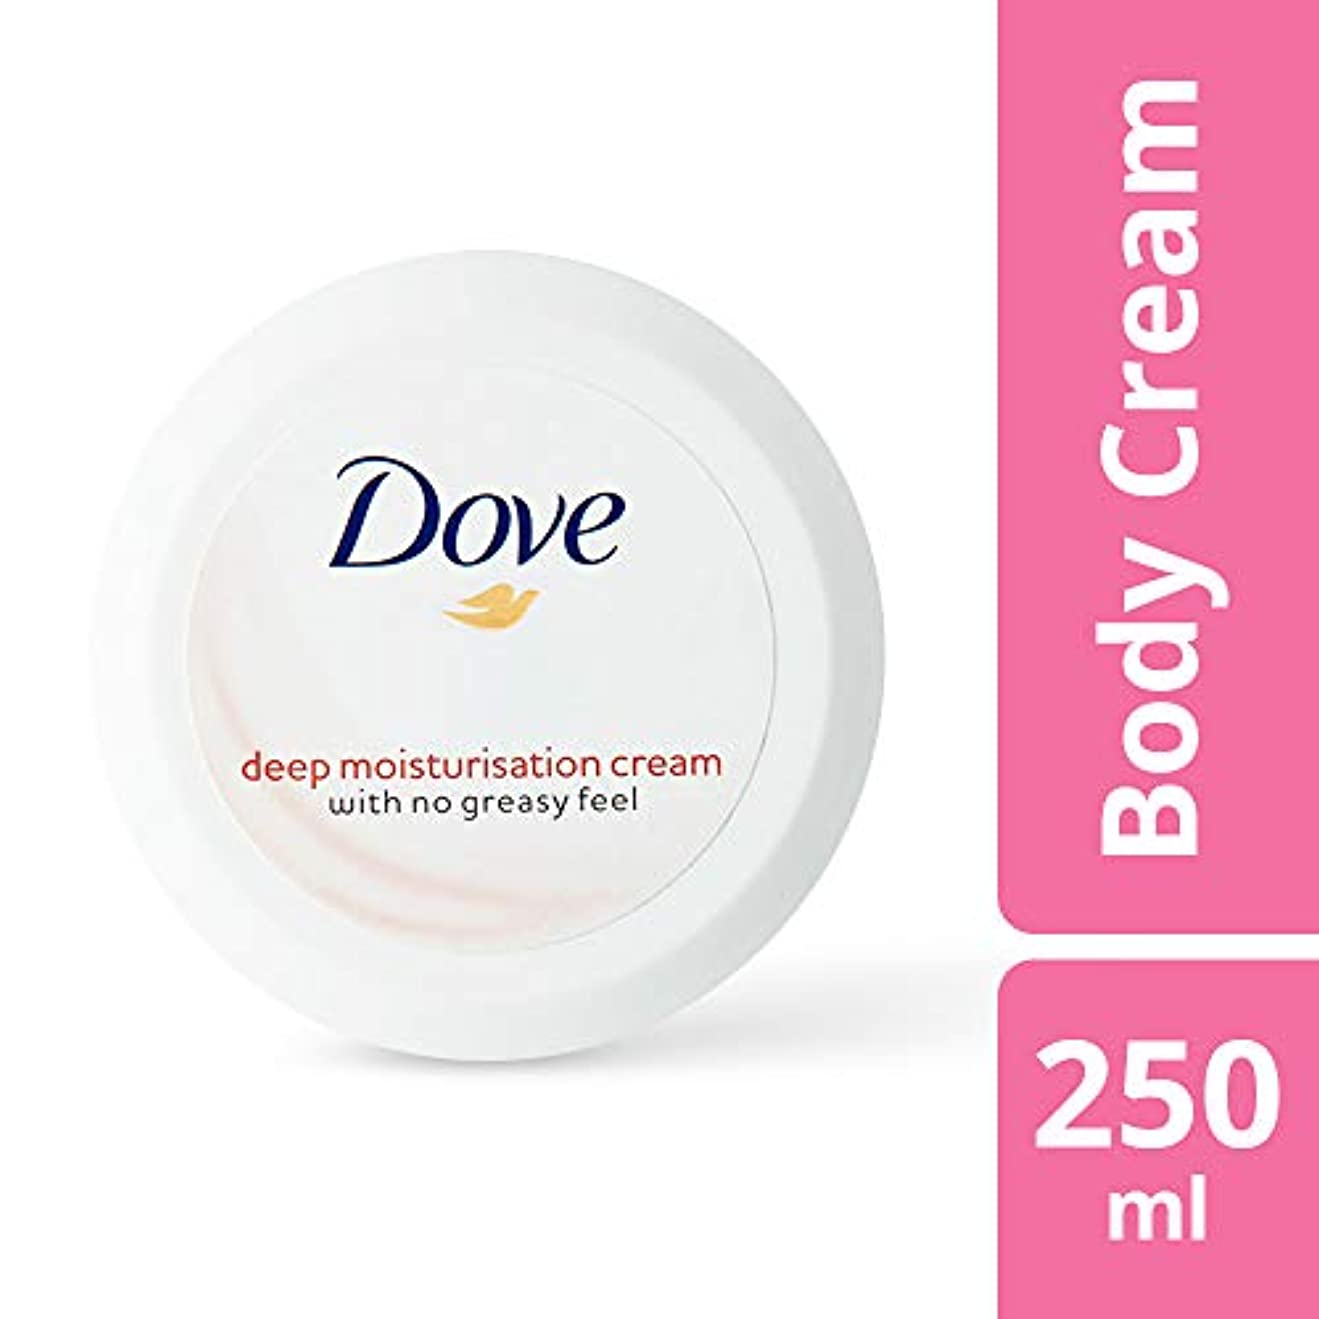 命令的挨拶歴史Dove Deep Moisturisation Cream, 250ml